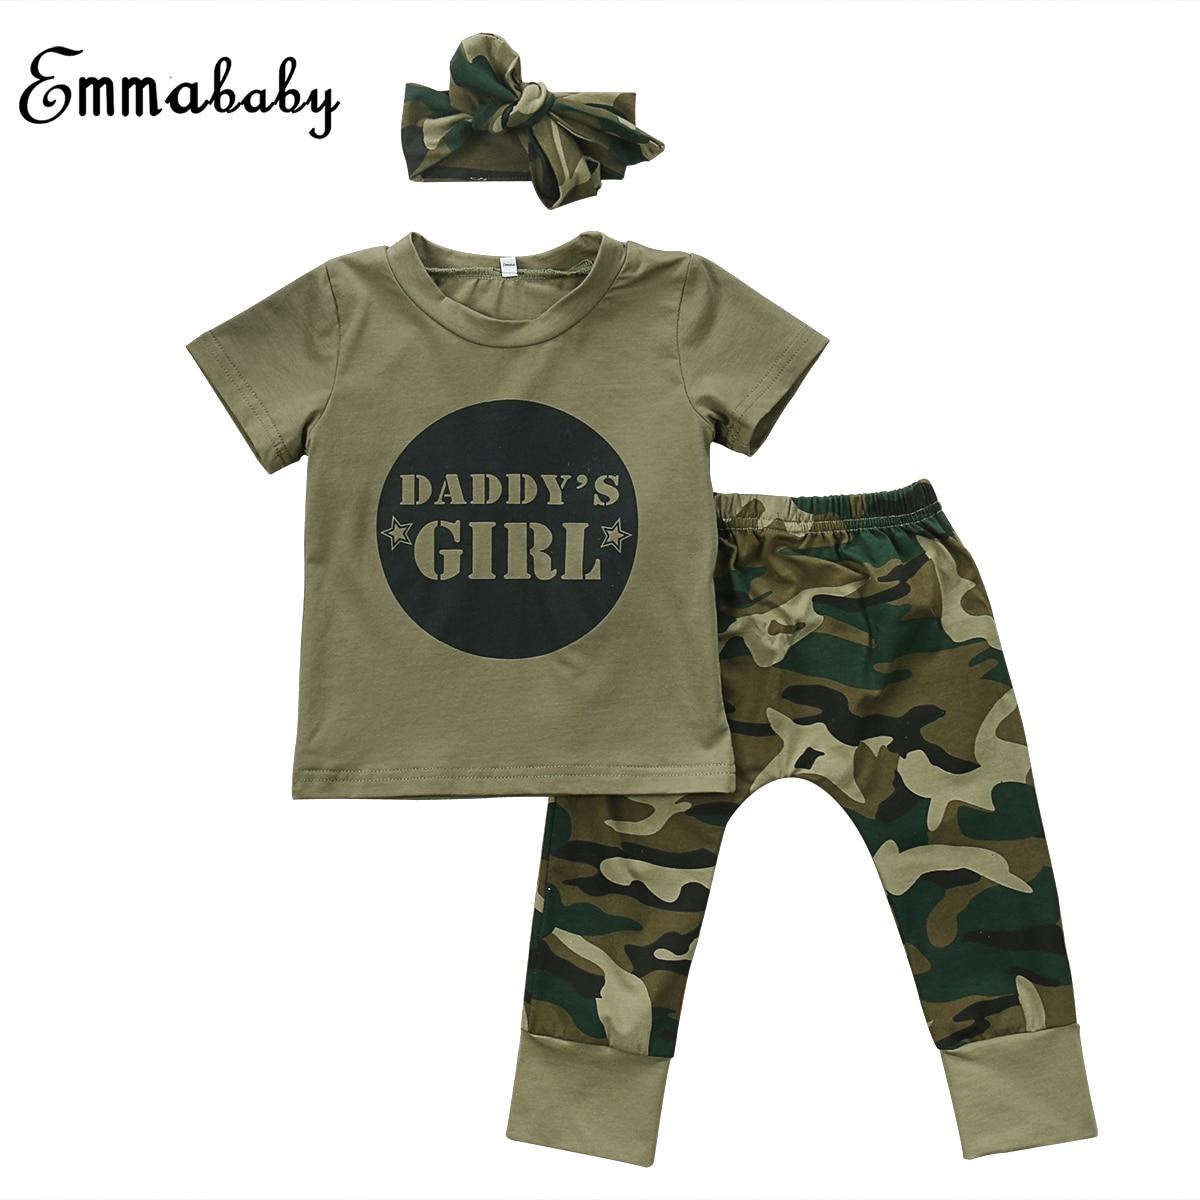 2017 Camouflage Shirt Fashion Baby Sets Newborn Toddler